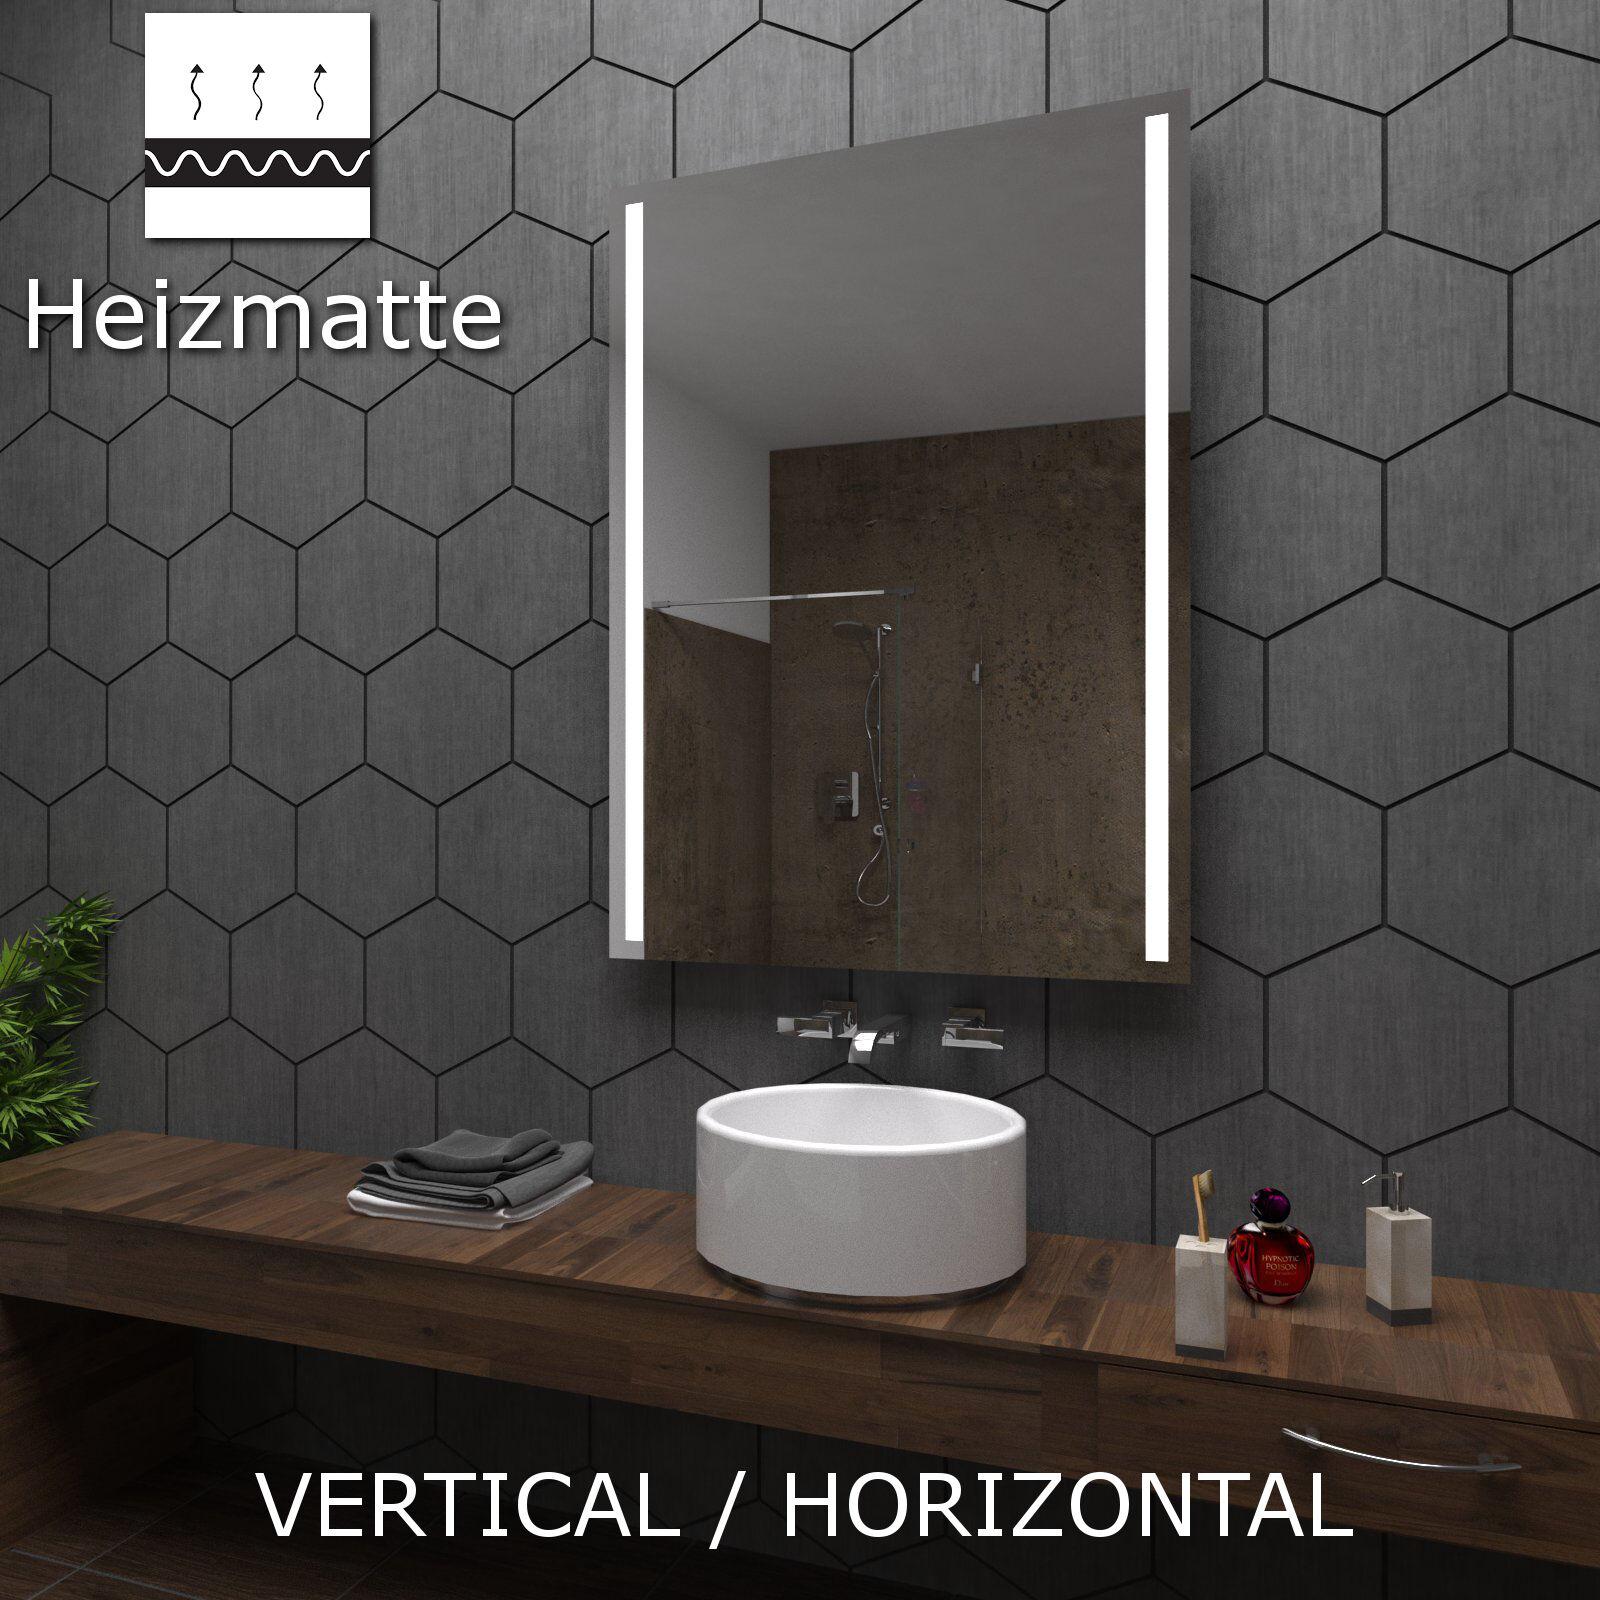 Badspiegel LED mit A02 Model DENVER Heizmatte Maß nach ...